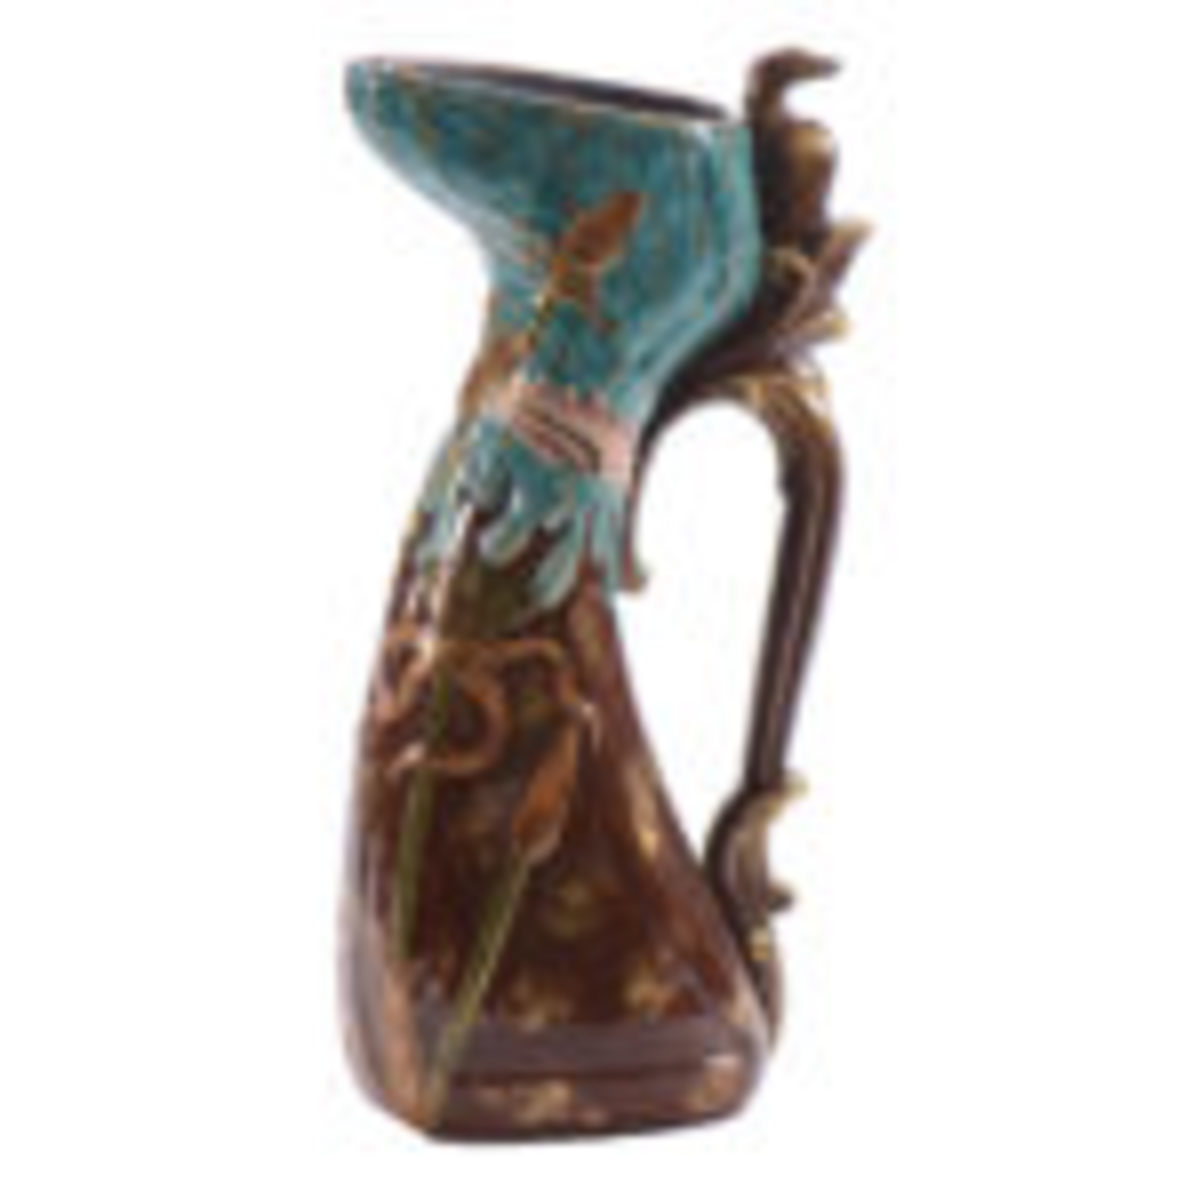 Galle pitcher